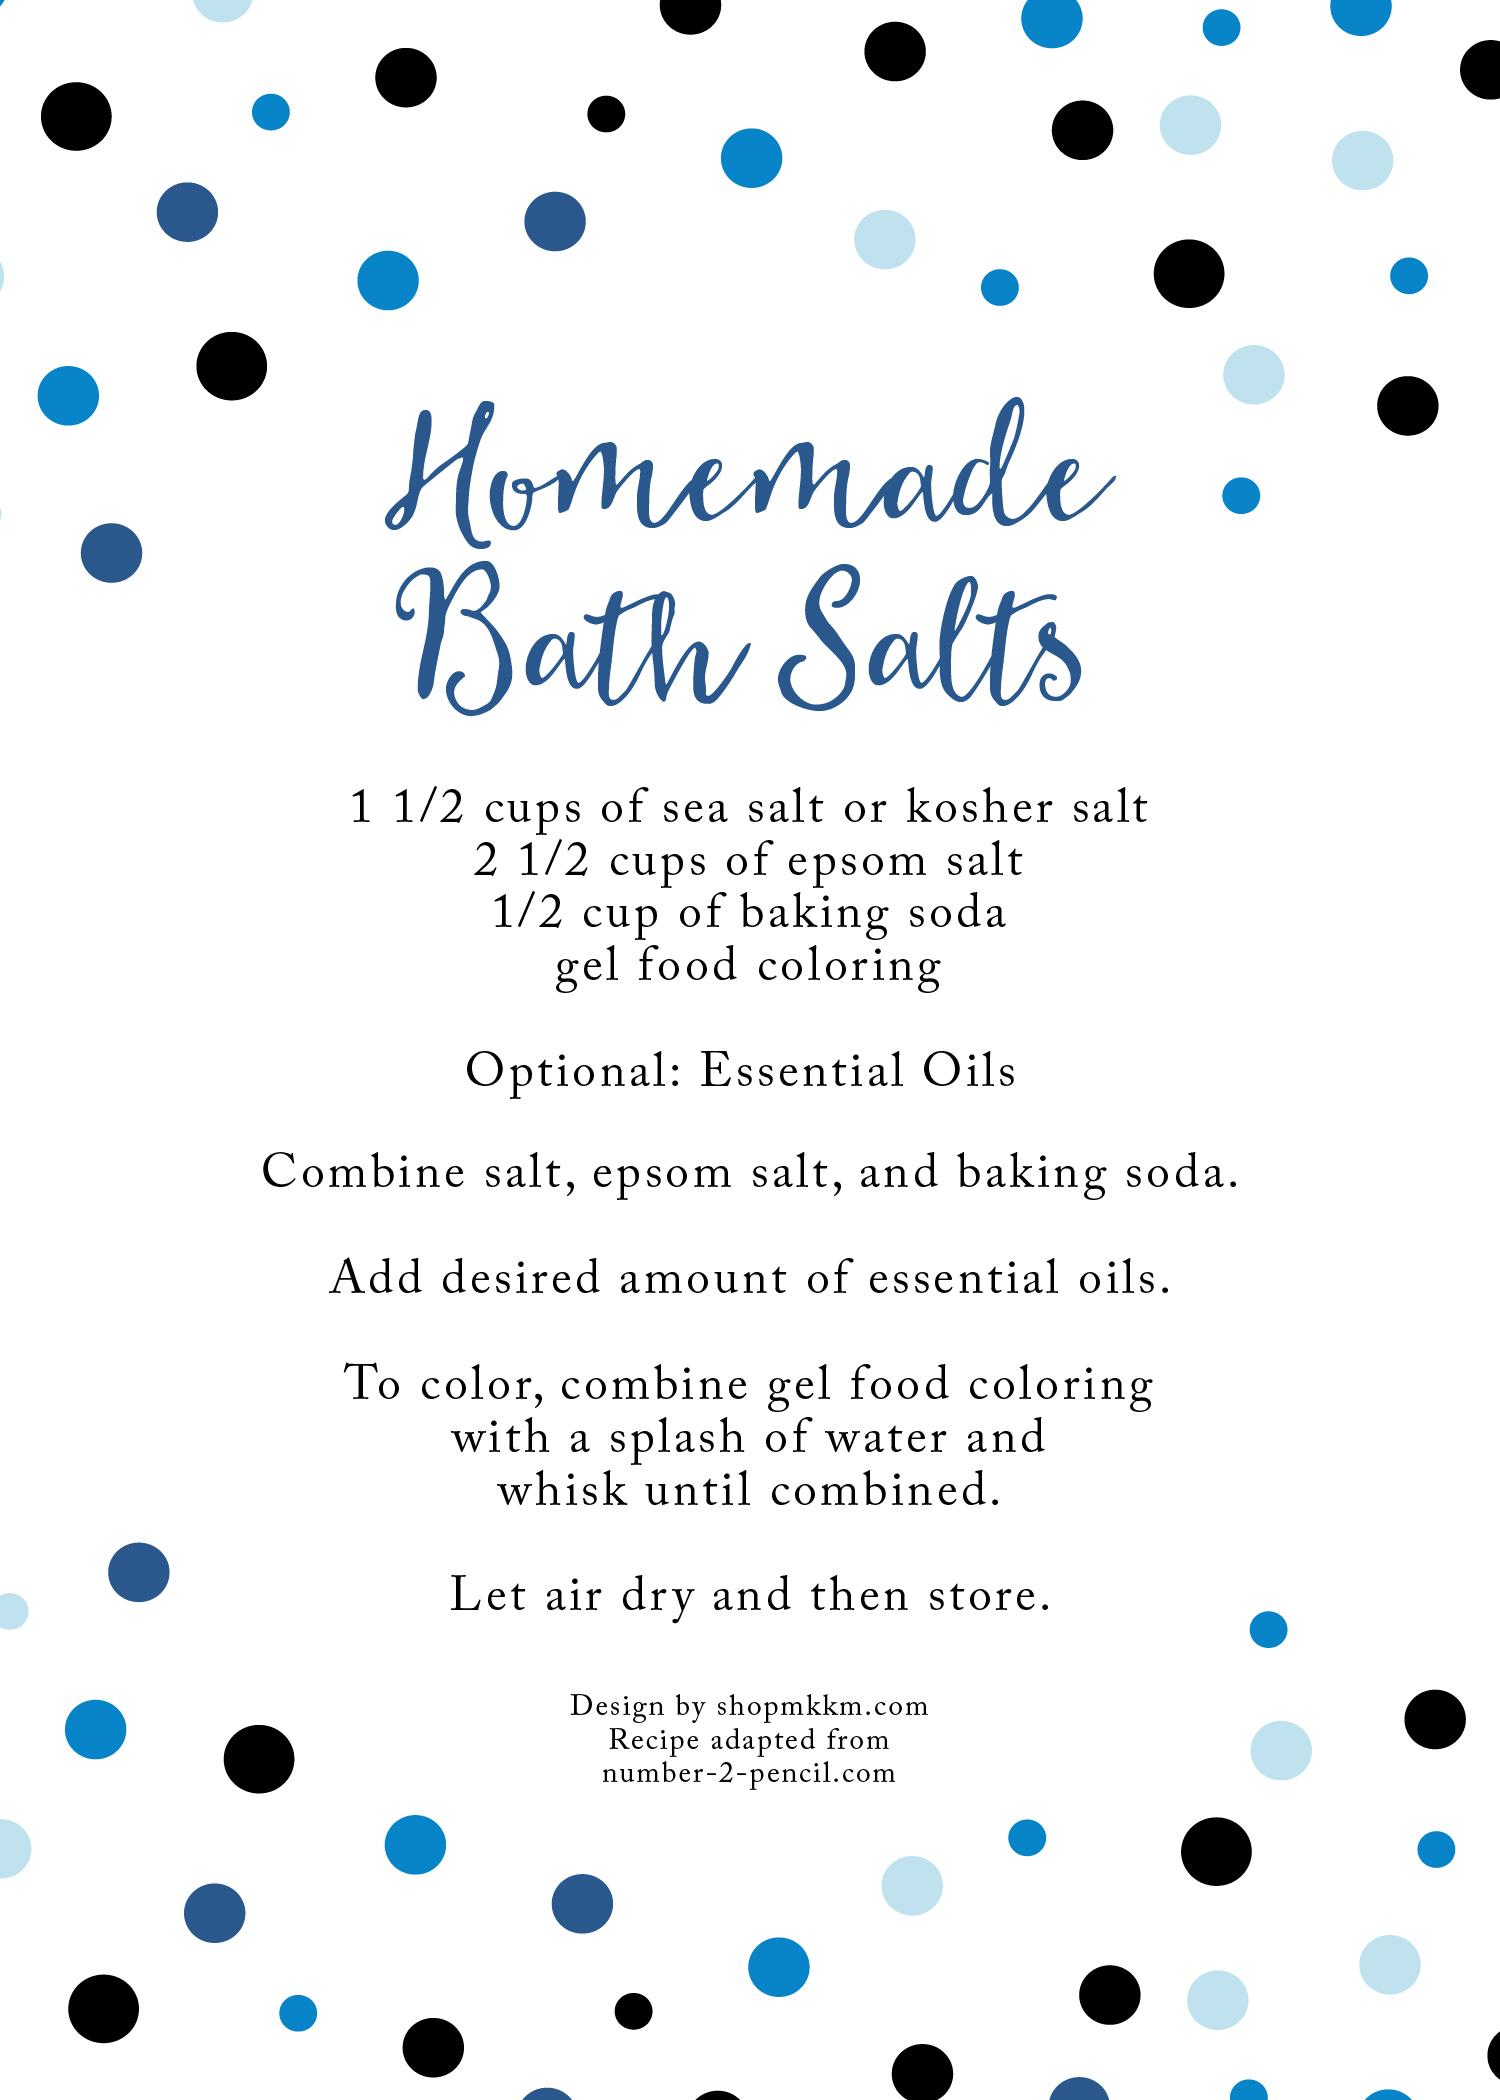 Homemade Bath Salts Recipe for baby shower favors. - Design by shopmkkm.com Recipe adapted from number-2-pencil.com